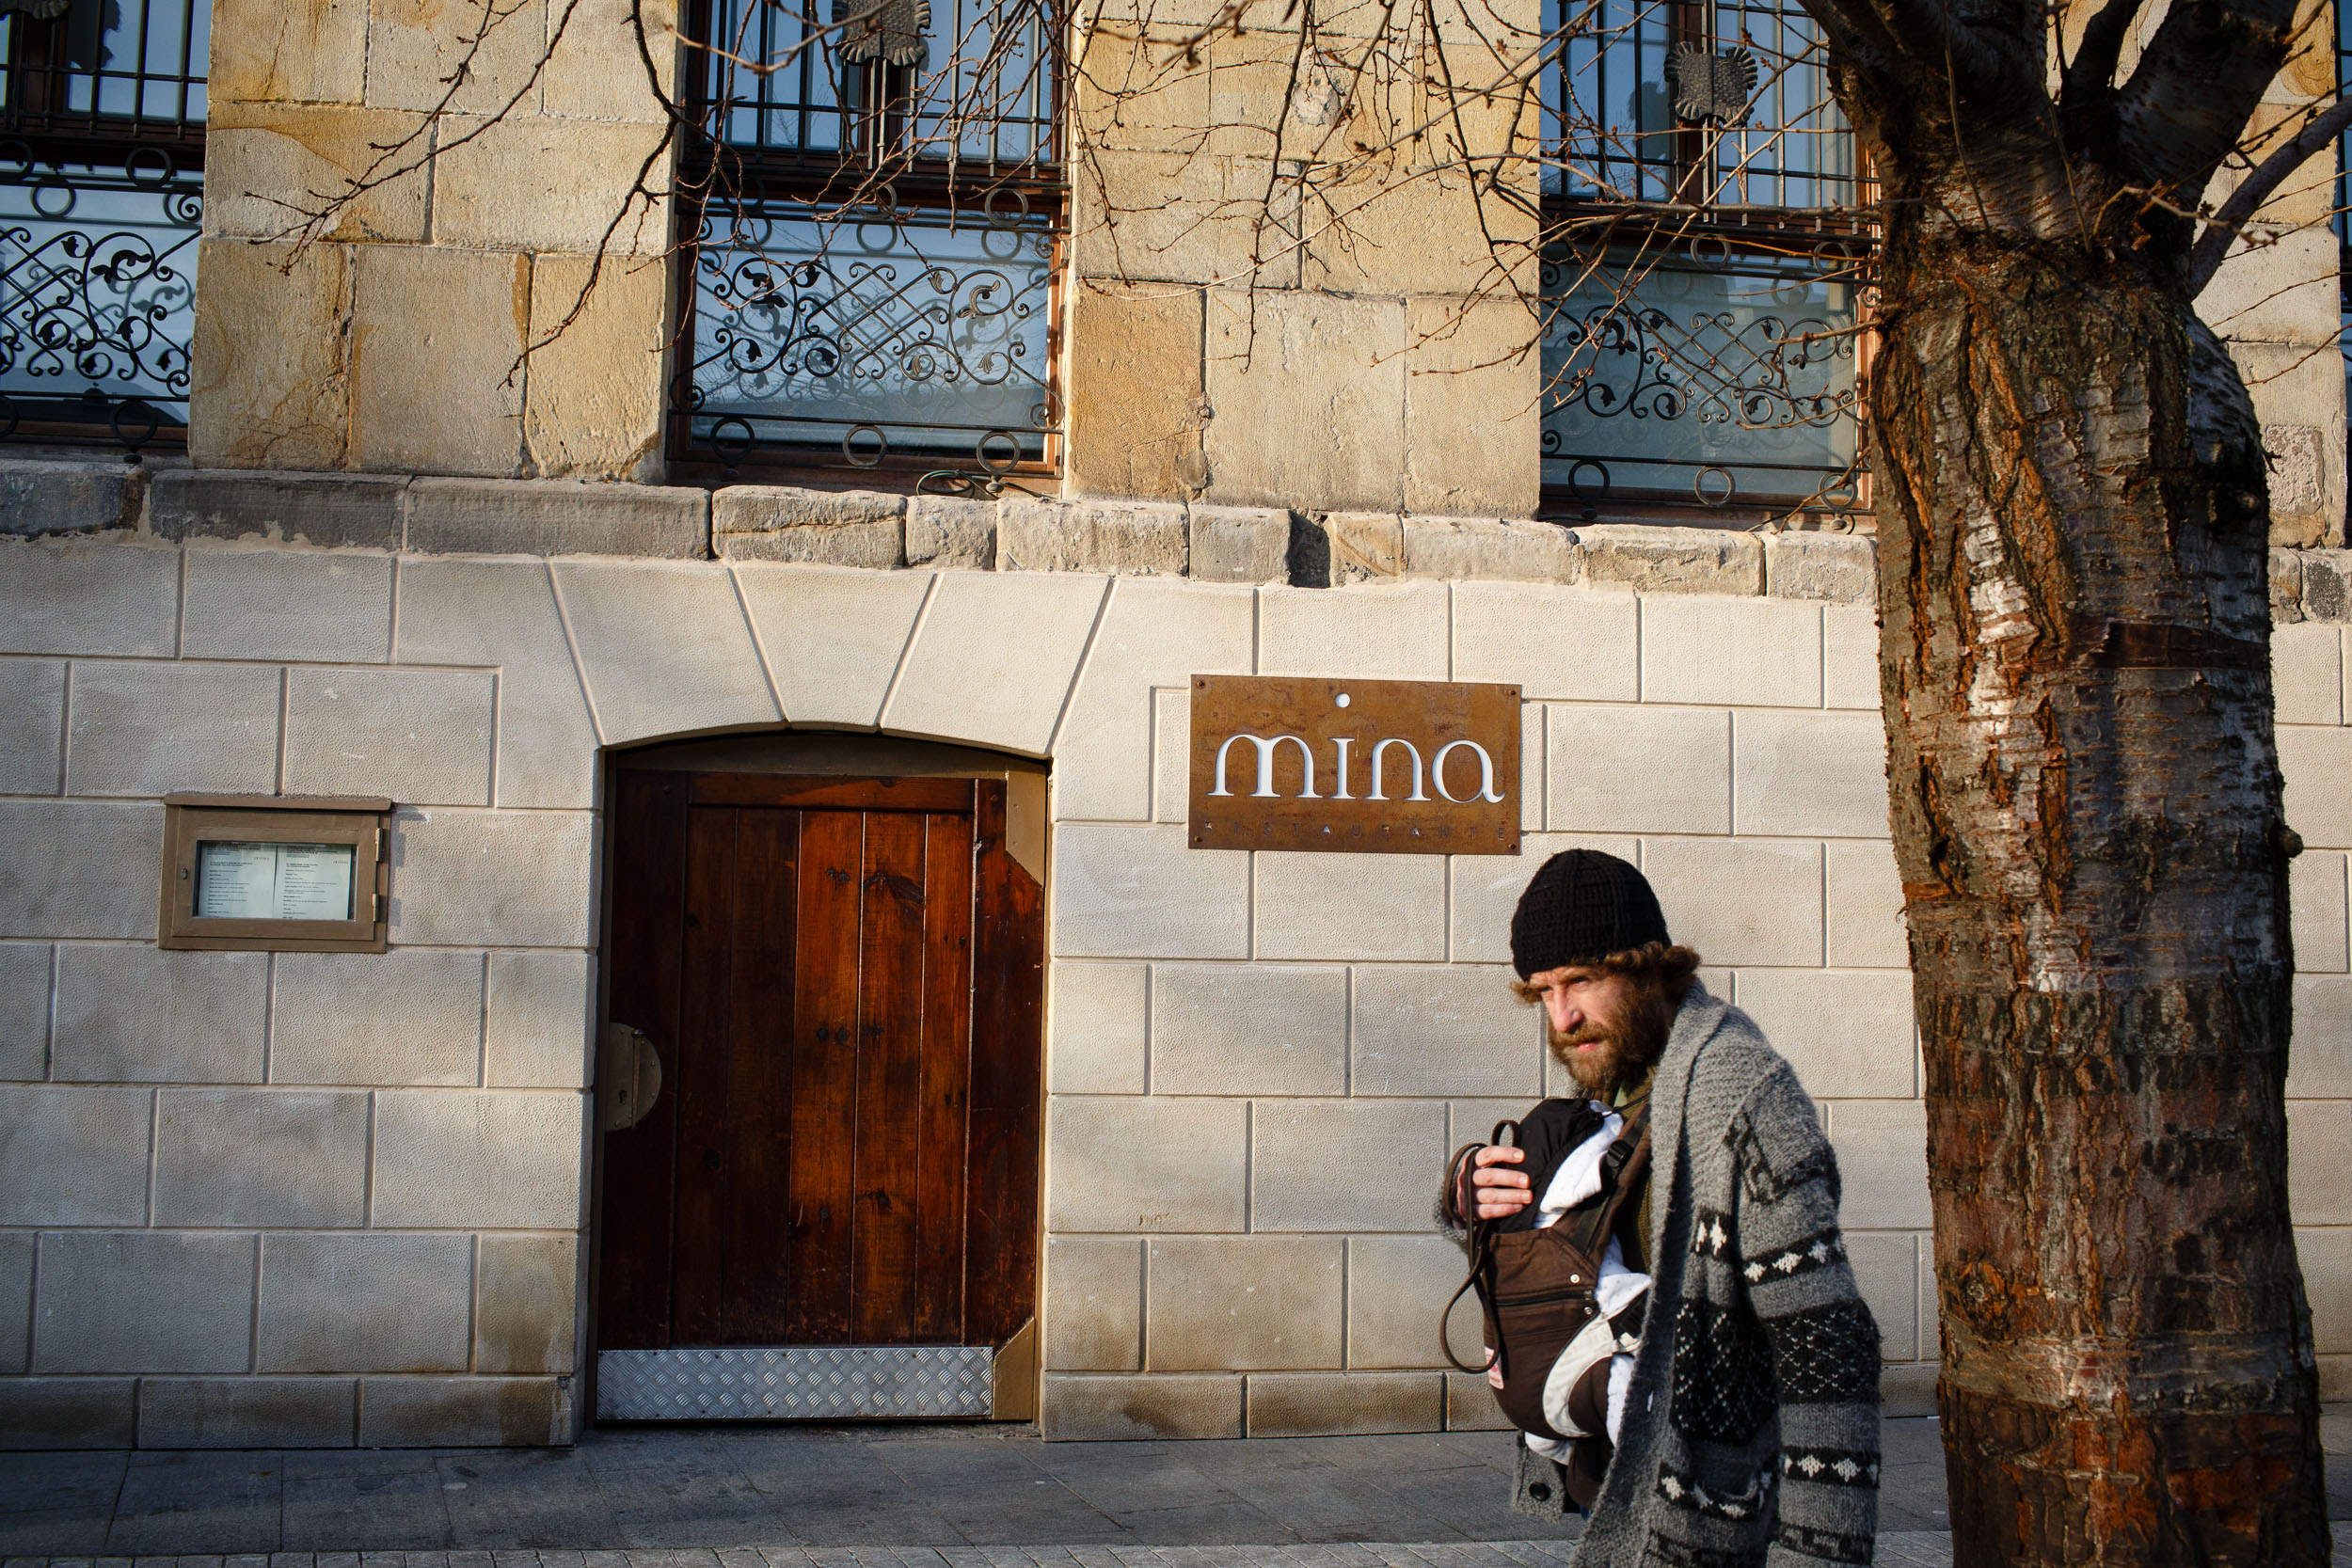 Fotografia Comercial en Bilbao | Retratos en Restaurante Mina Bilbao Bizkaia- James Sturcke  Photographer | sturcke.org_007.jpg